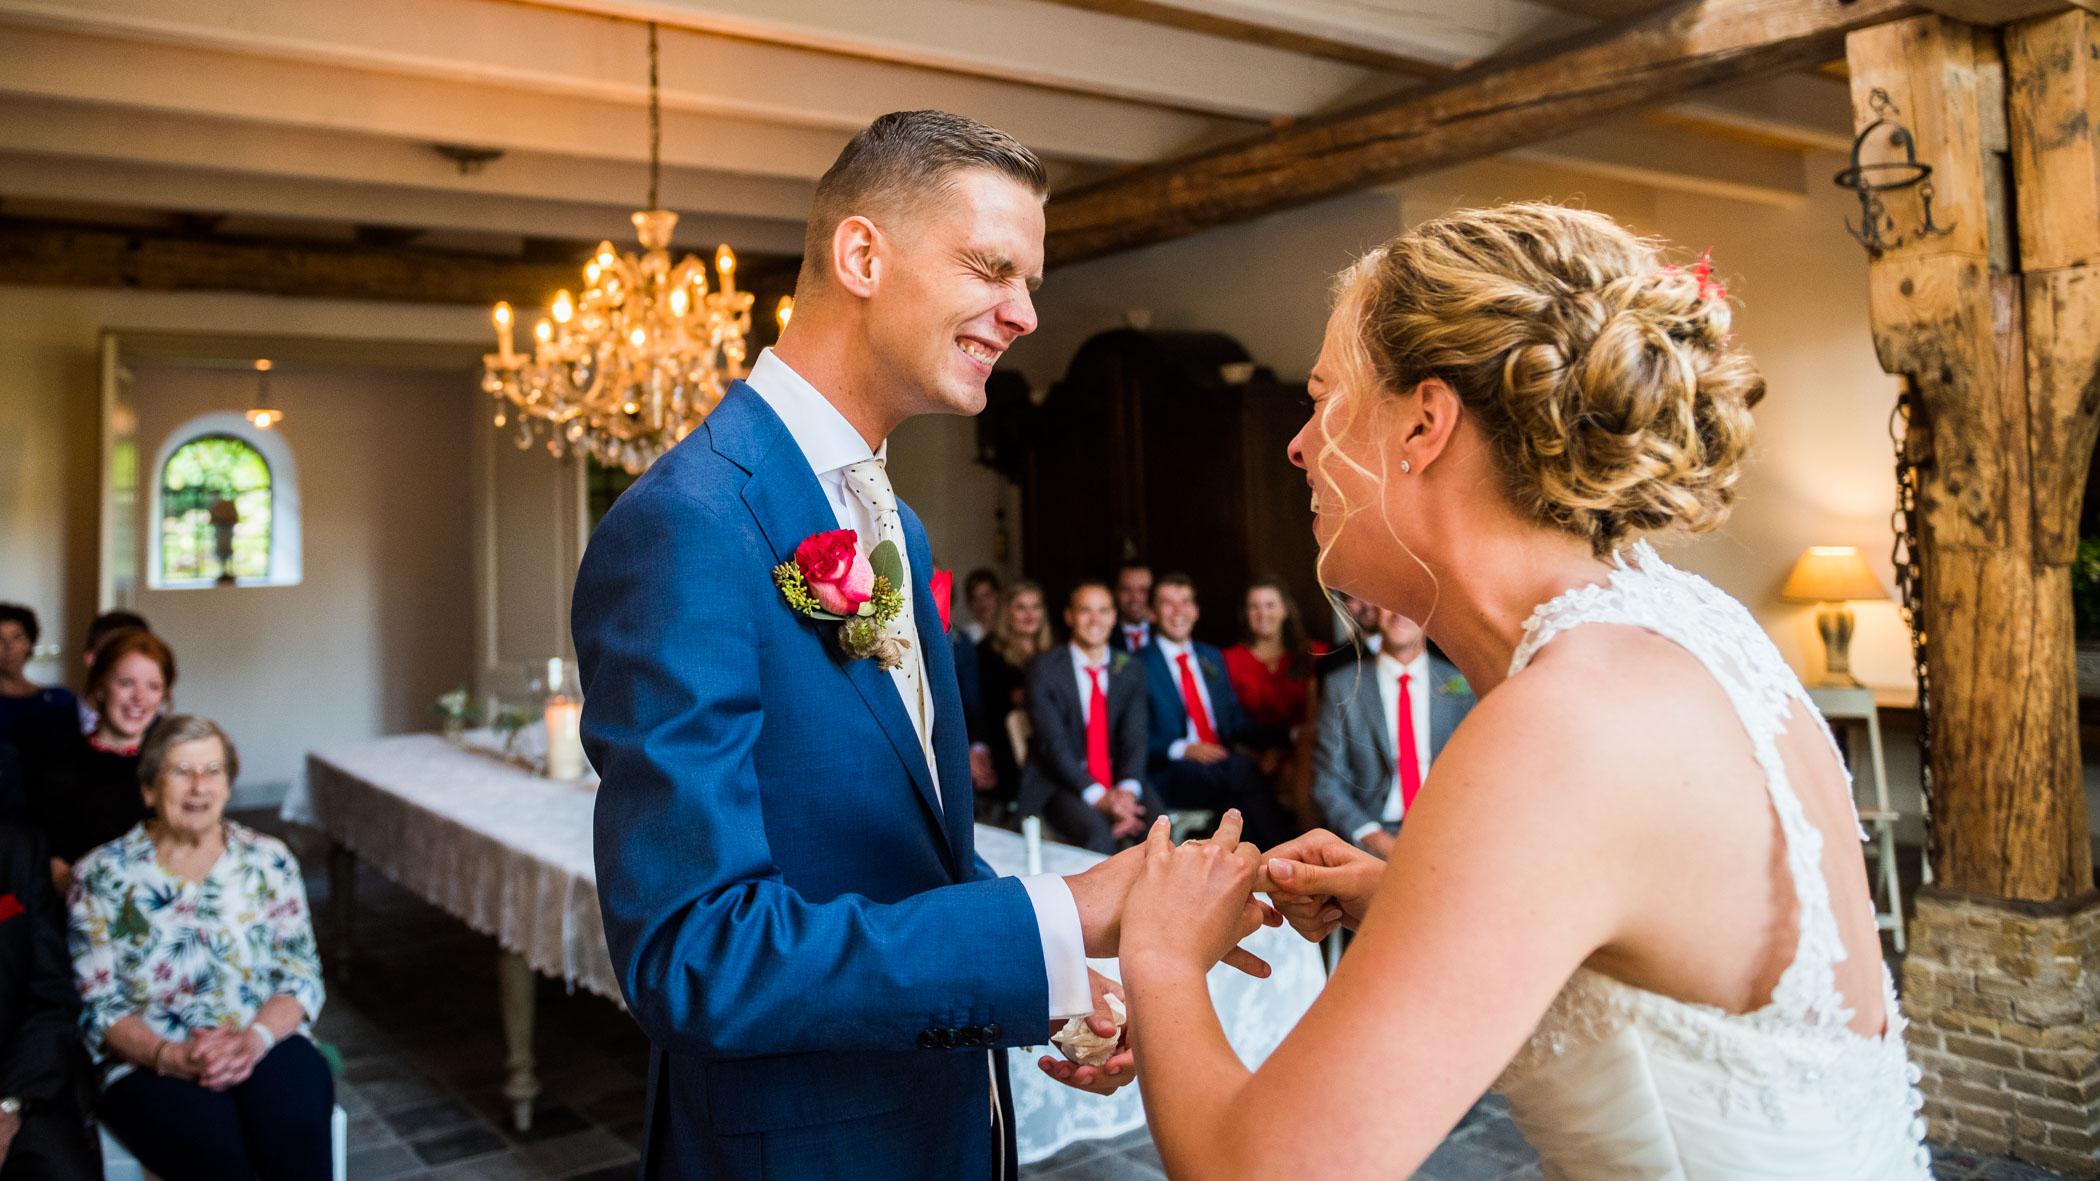 Ring omdoen bruiloft